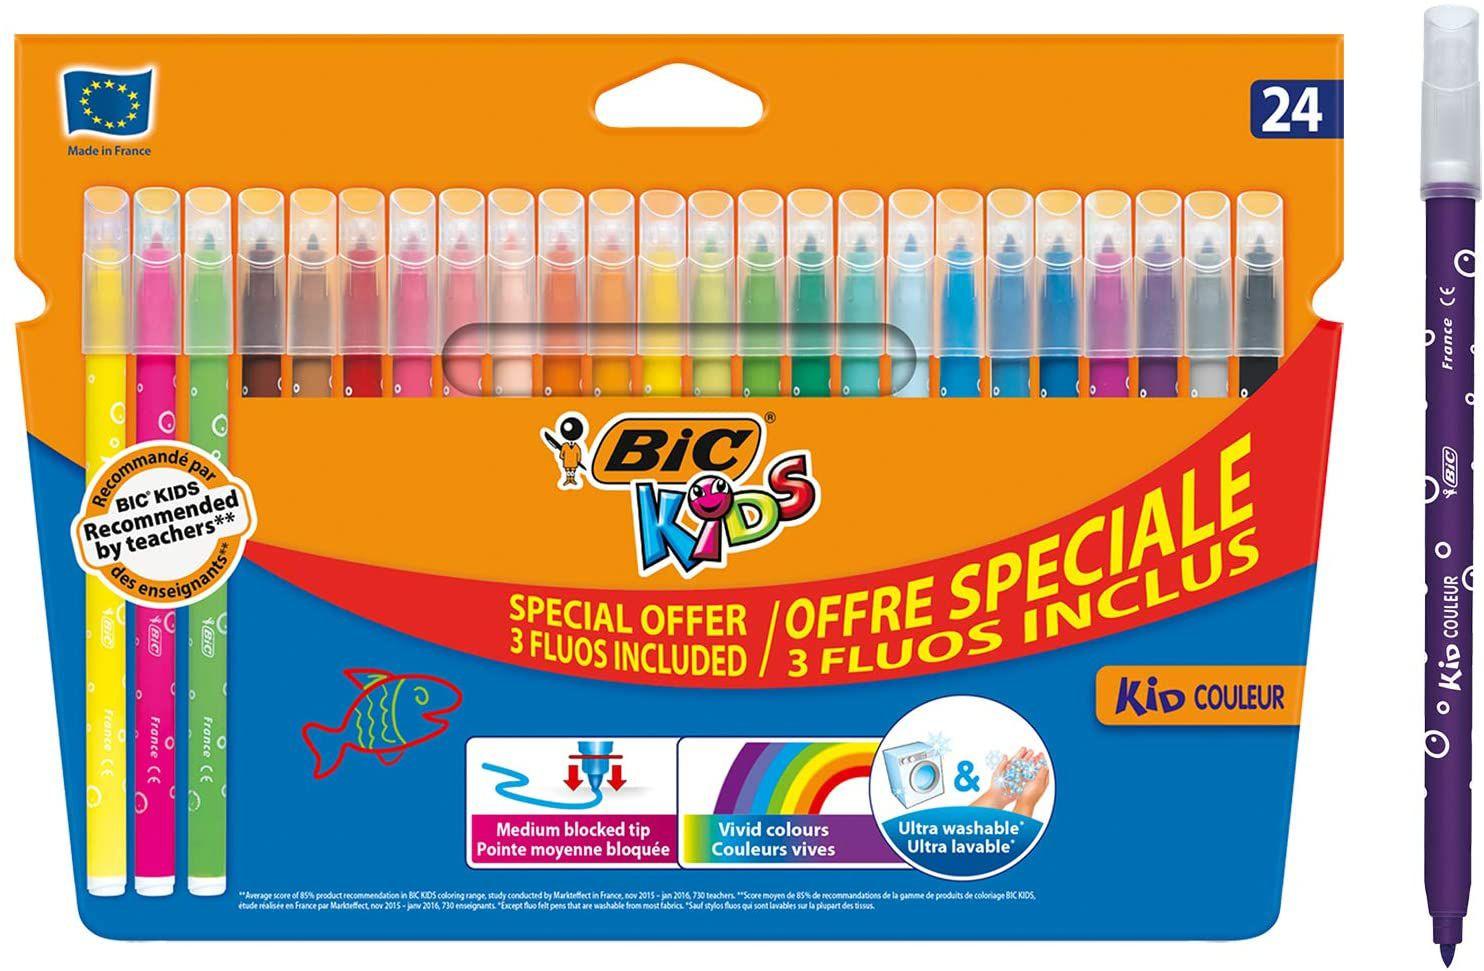 Bic Kids 24 pack Flamastry Kid Couleur Fluo Pudelko 20+4 sztuki £2.65 @ Amazon (£4.49 p&p non prime)